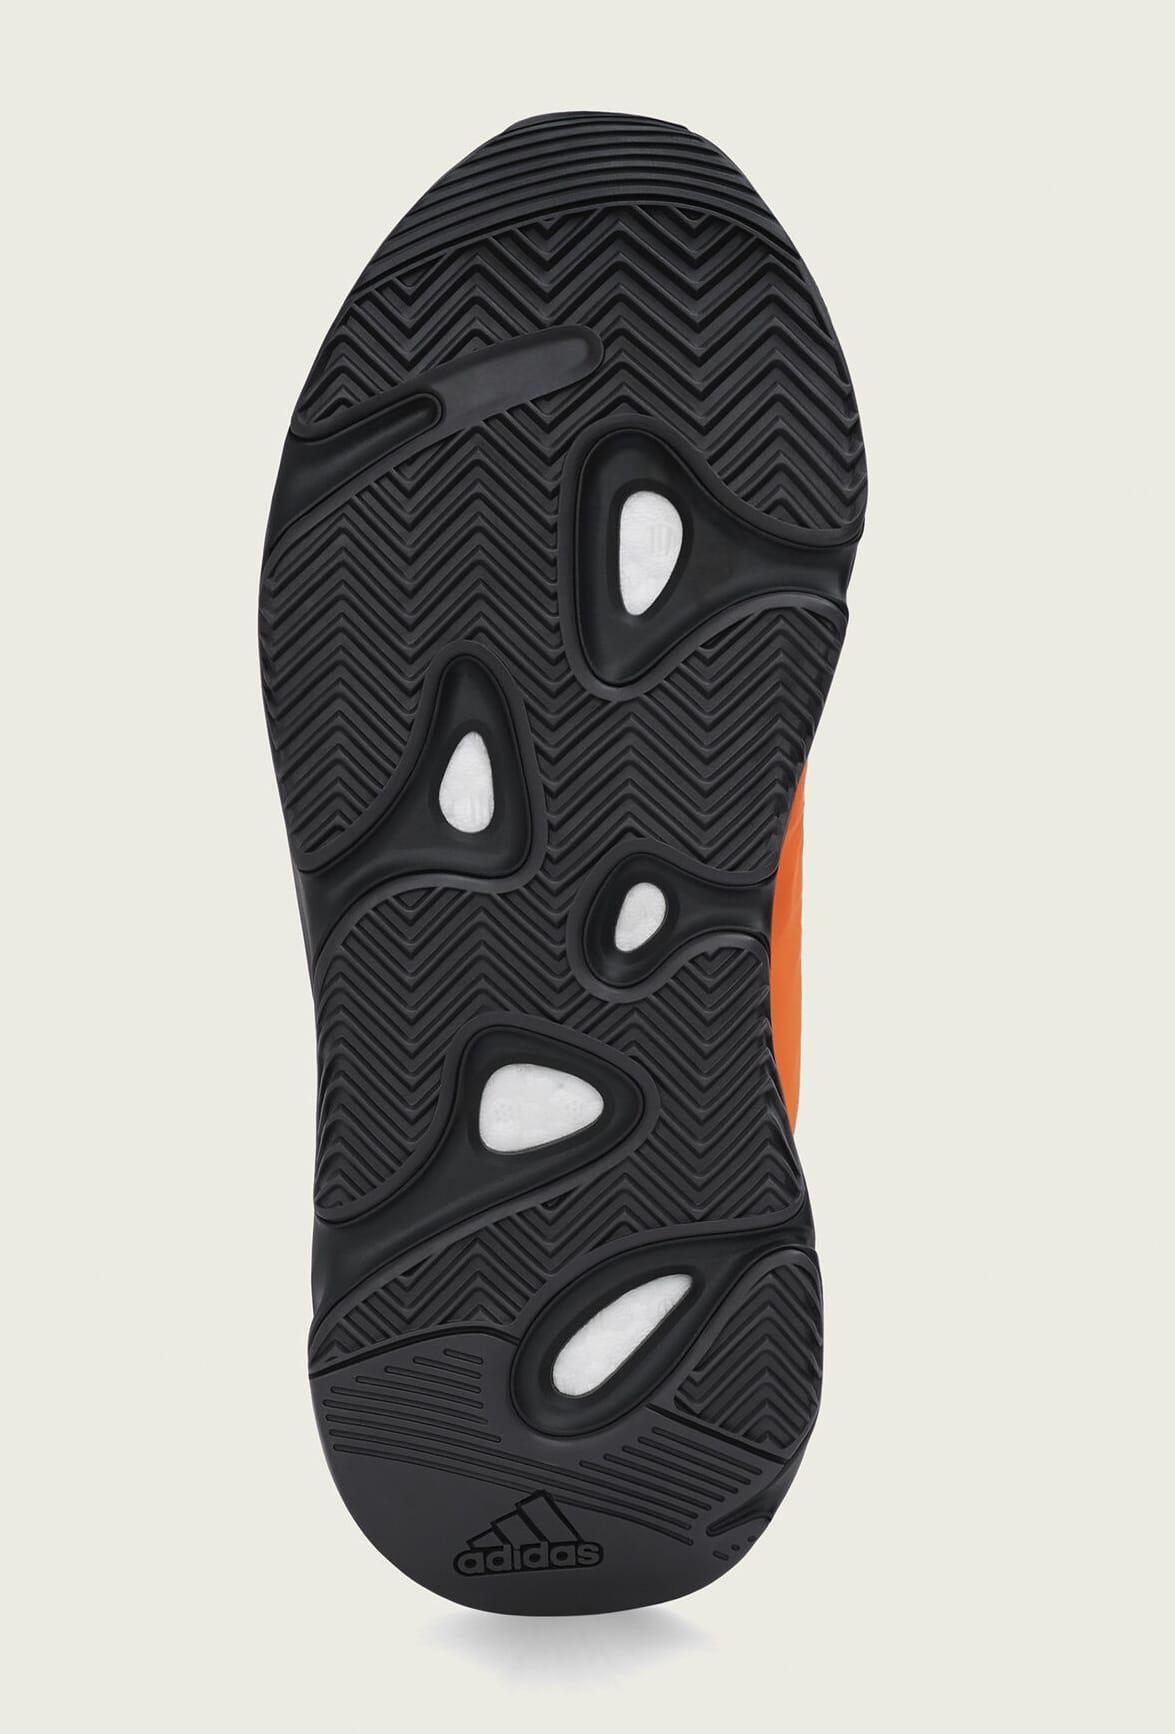 adidas-yeezy-boost-700-mnvn-orange-fv3258-outsole